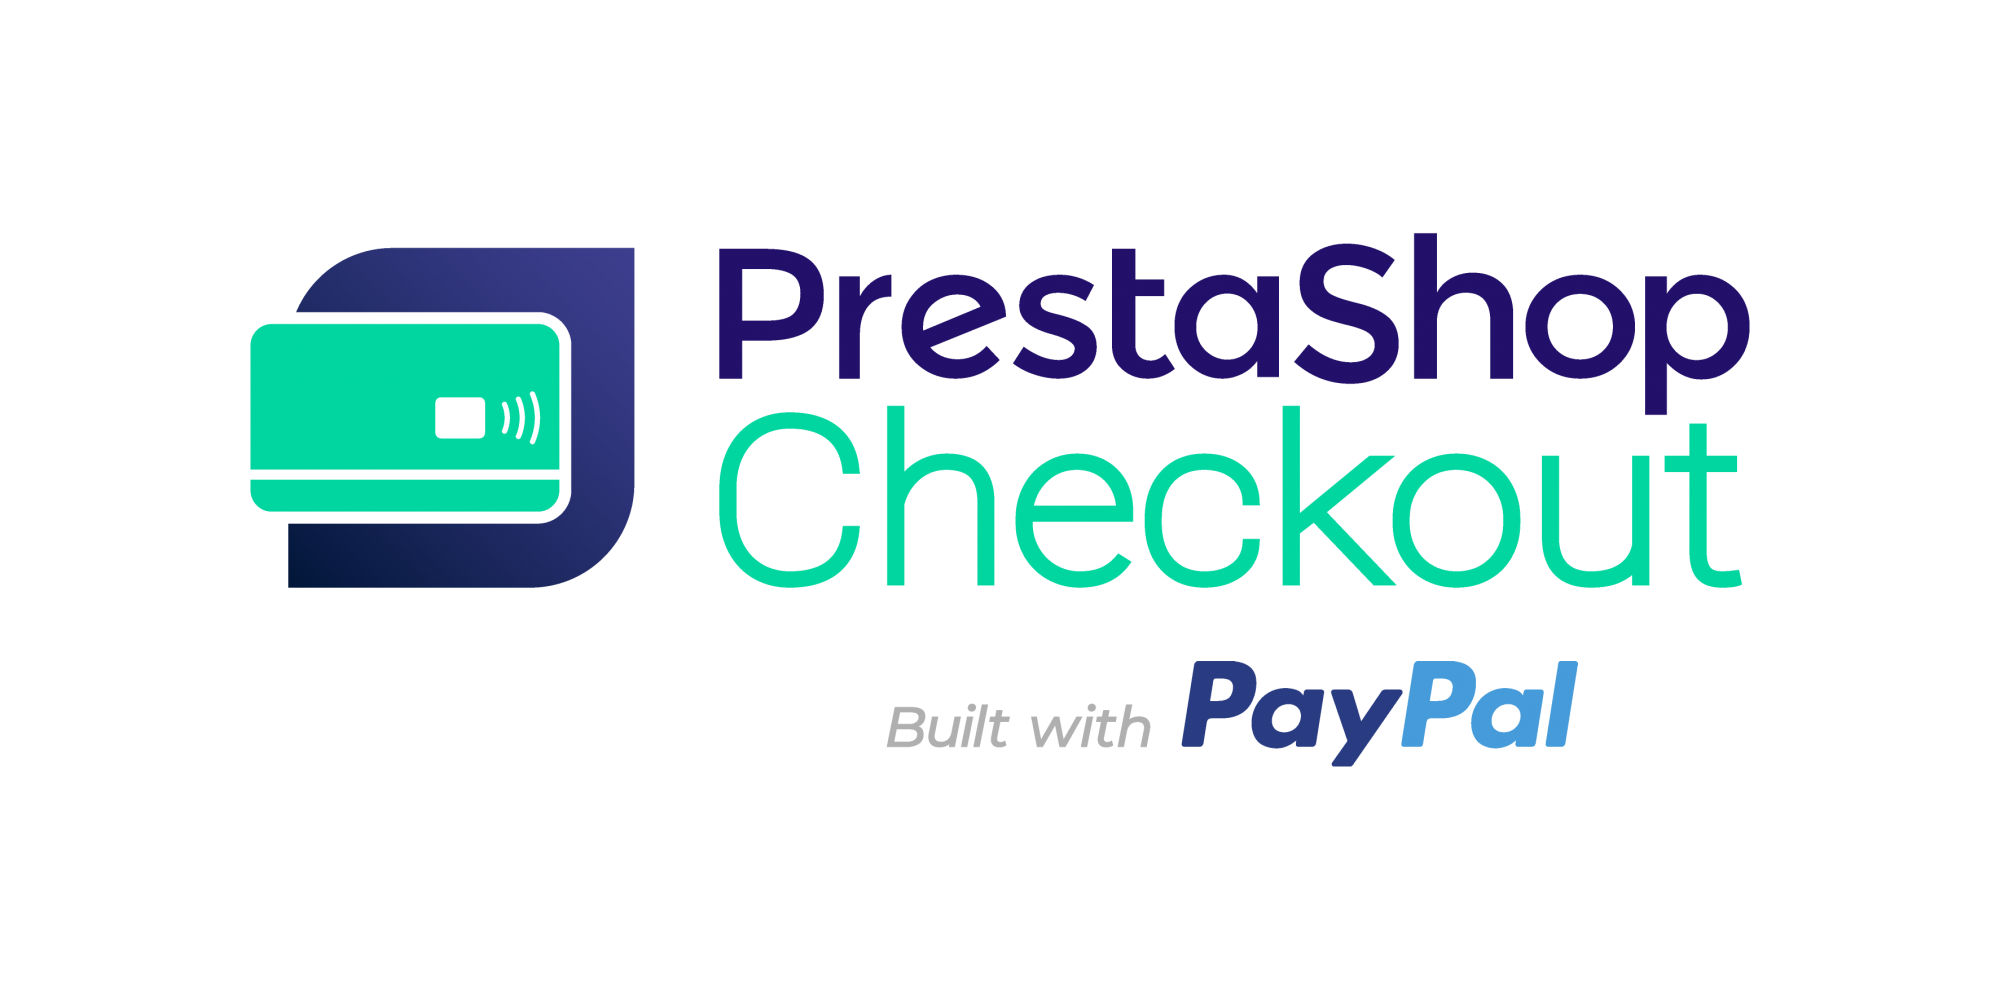 PrestaShop e PayPal annunciano la piattaforma PrestaShop Checkout thumbnail